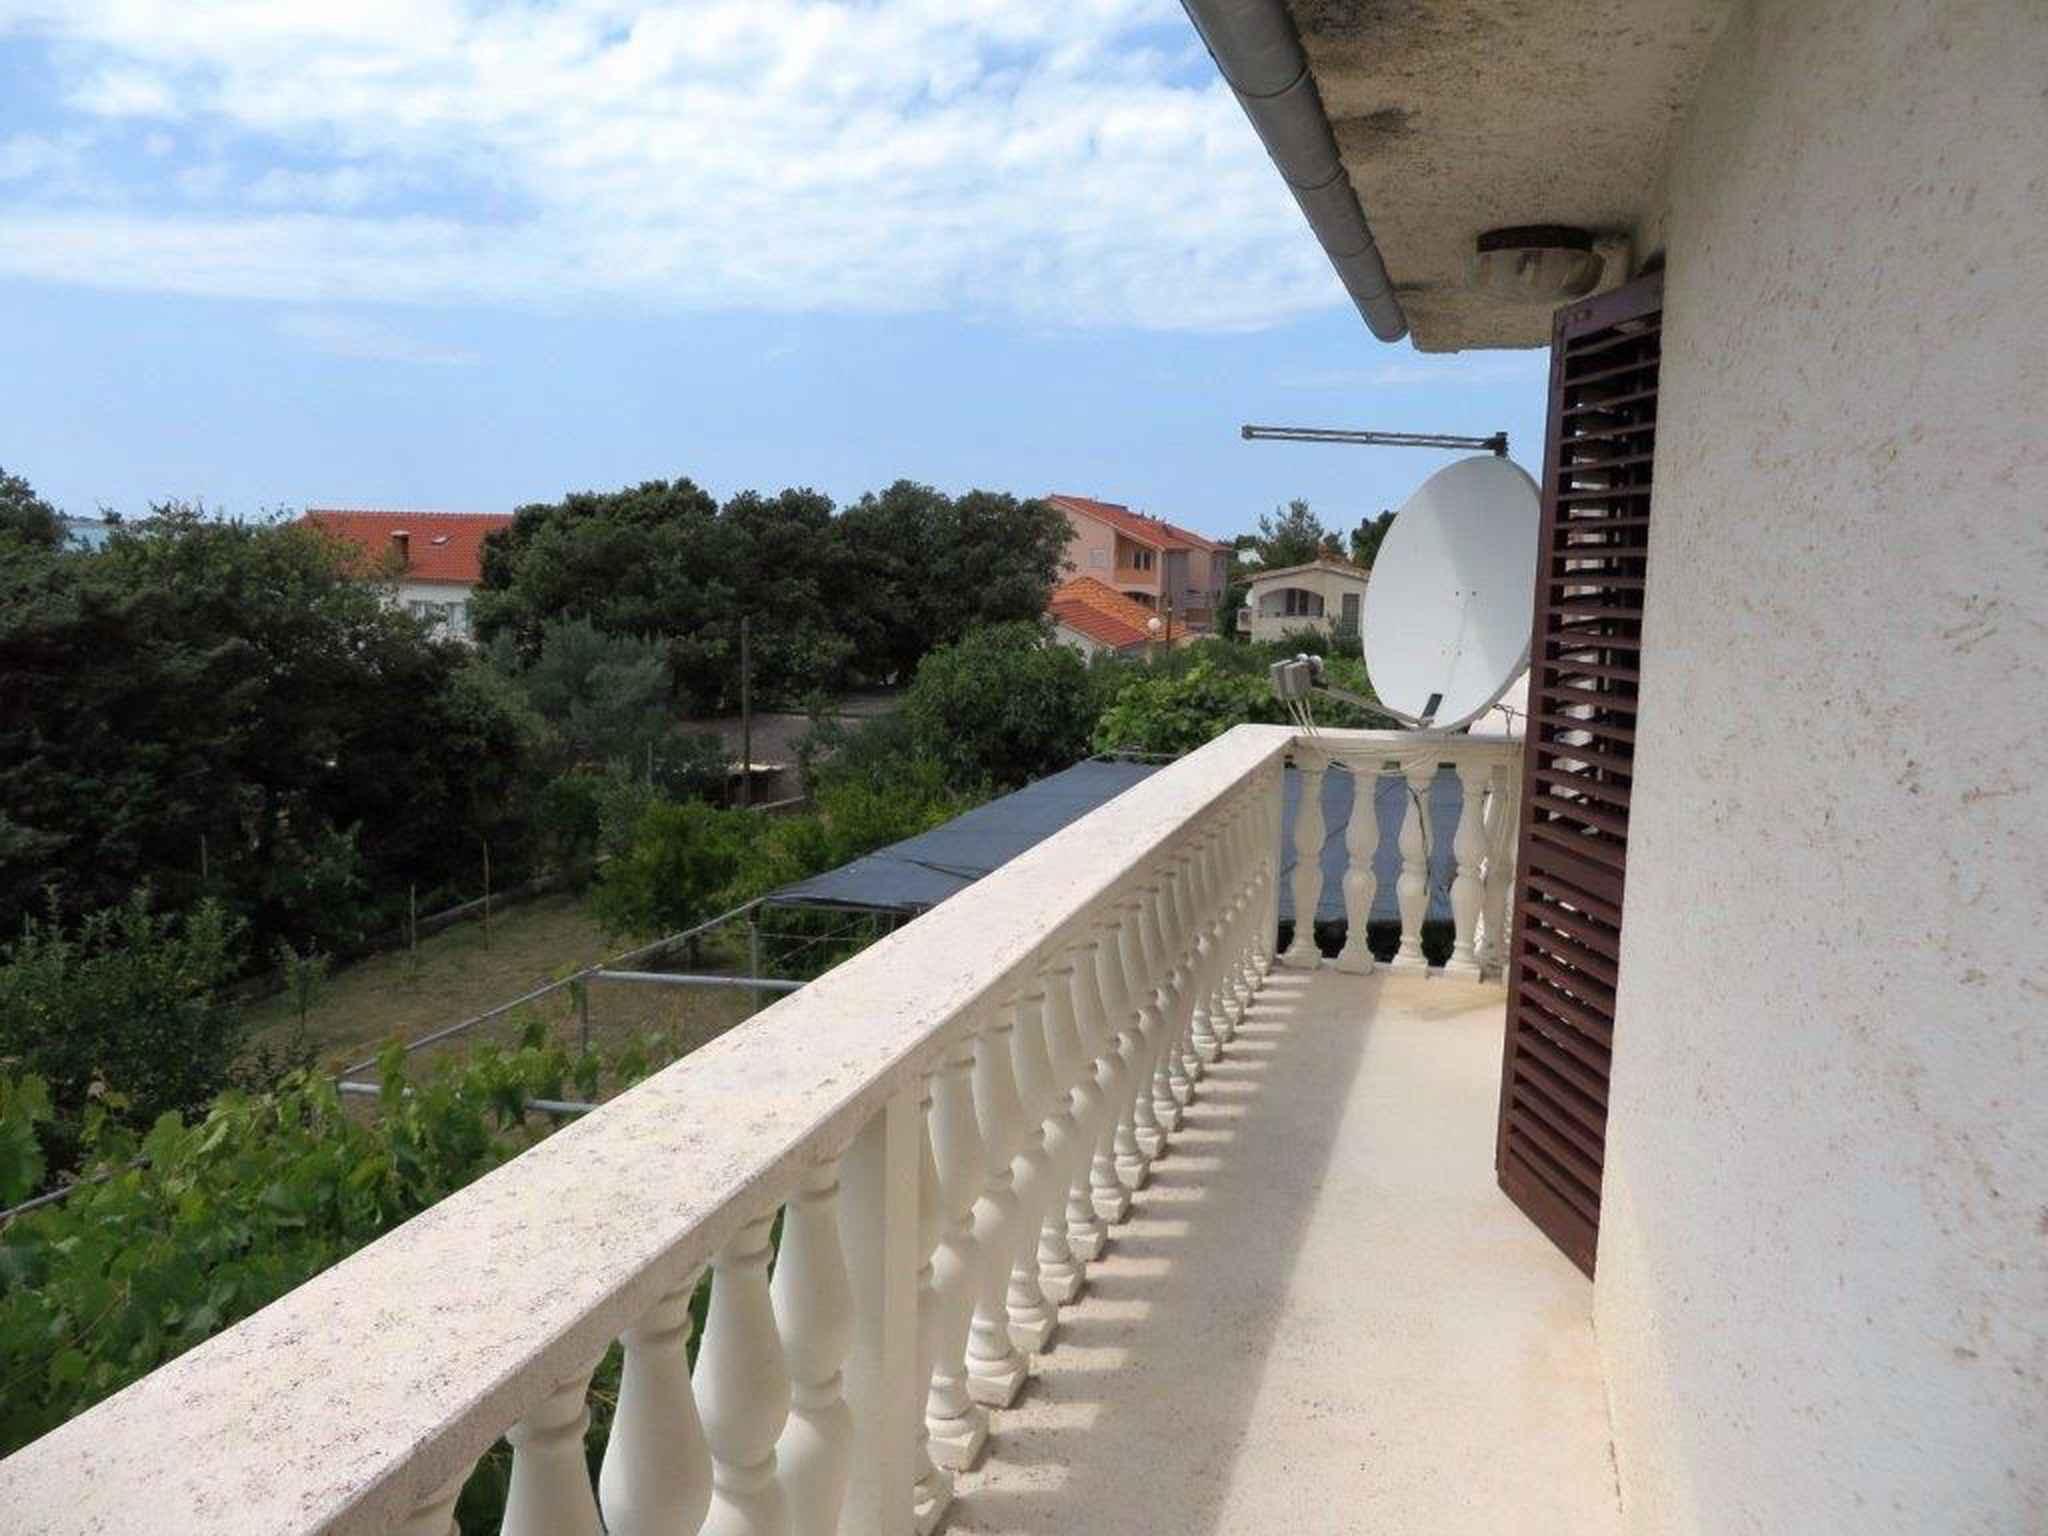 Ferienhaus samo 80 metara od Jadranskog mora (325274), Vrsi, , Dalmatien, Kroatien, Bild 7